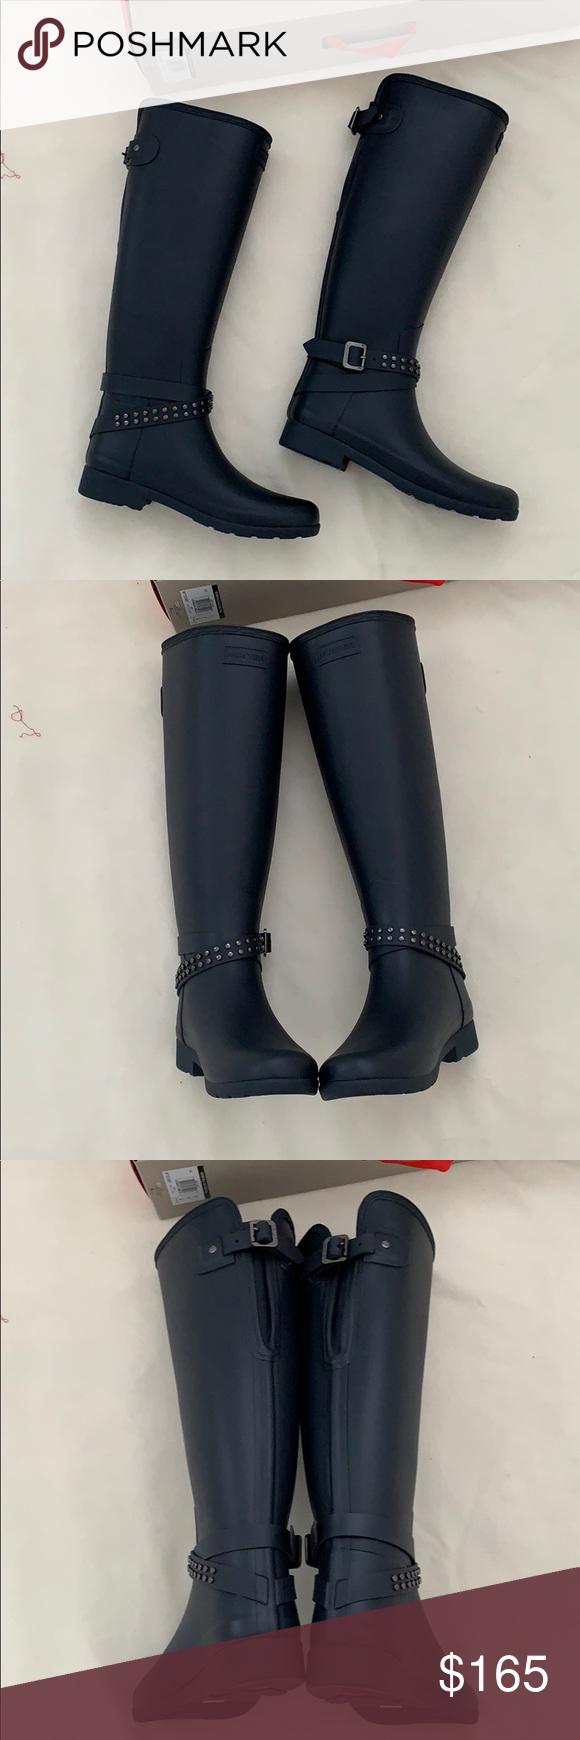 6055bb62a57 Hunter refined adjustable tall matte rain boot New in box Hunter ...